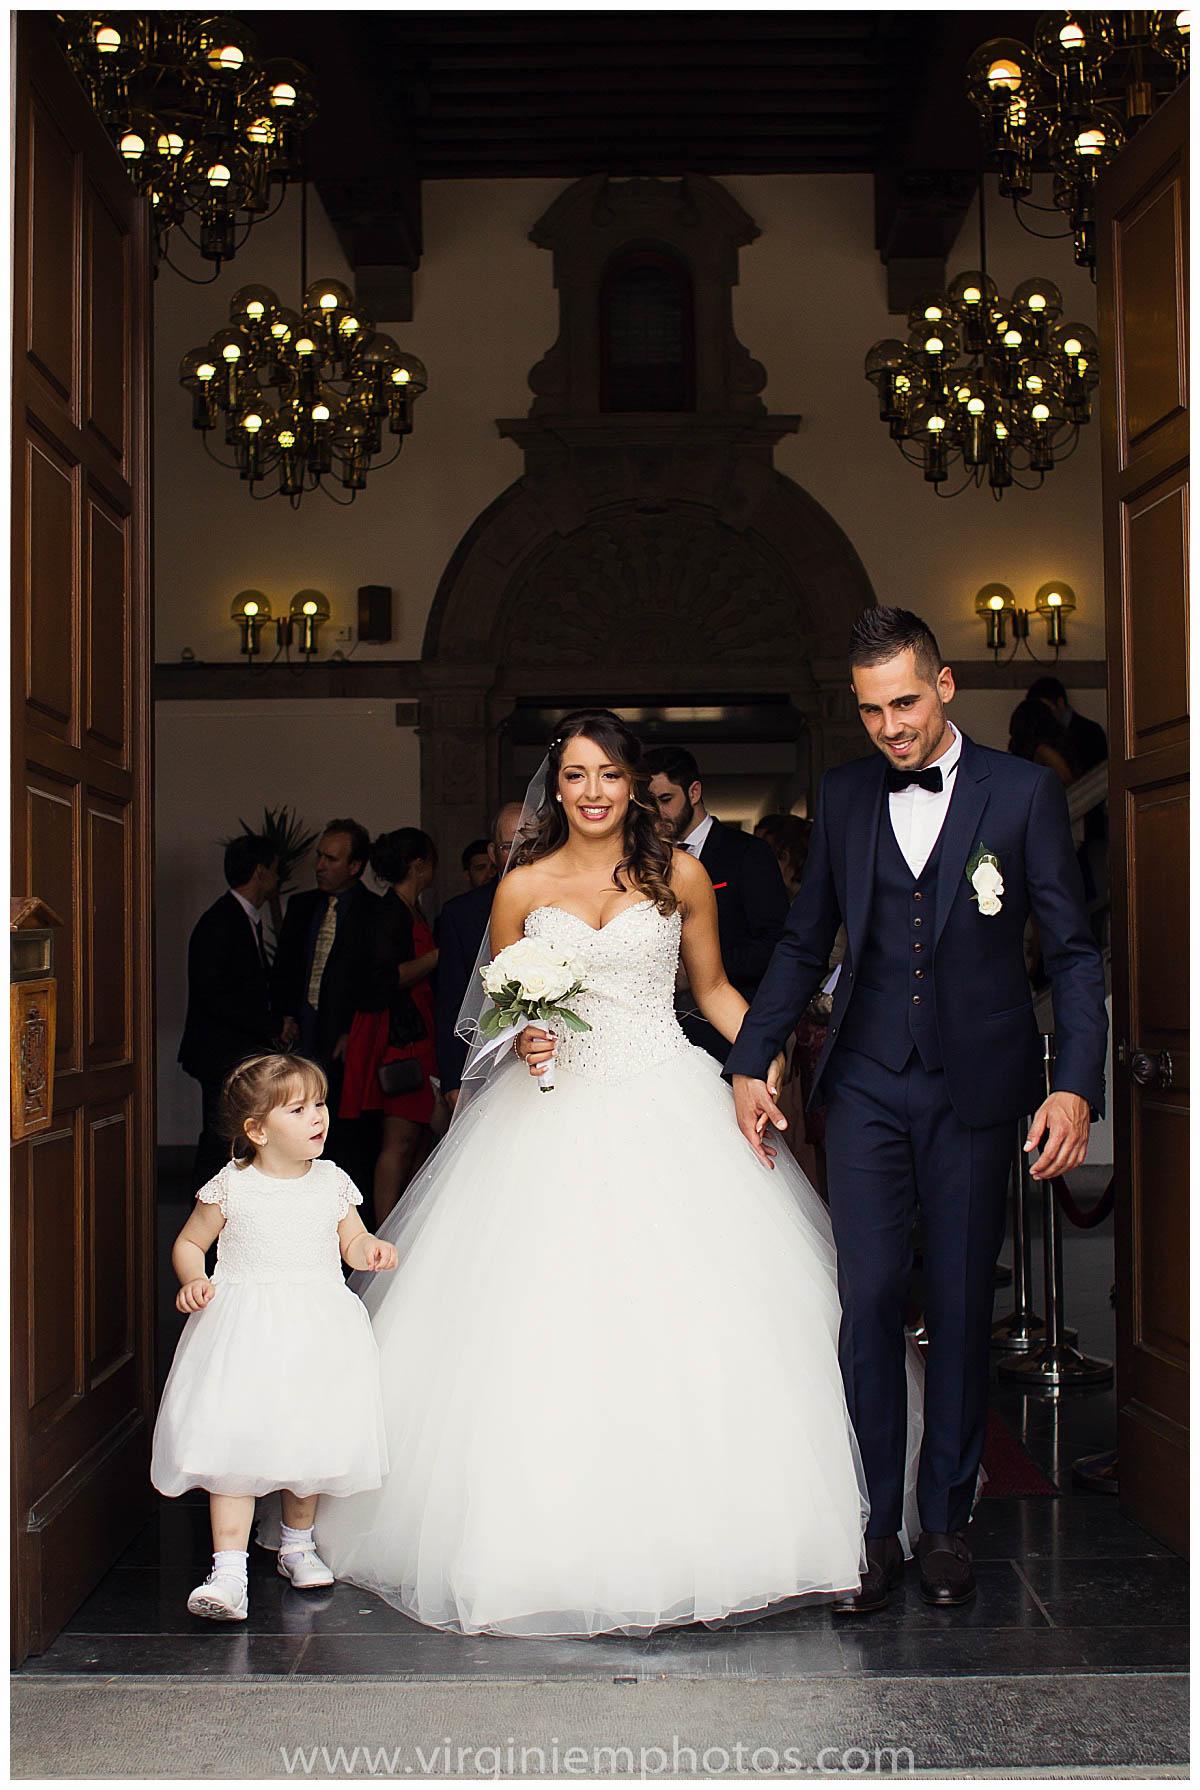 Virginie M. Photos-photographe mariage nord-Mairie (5)